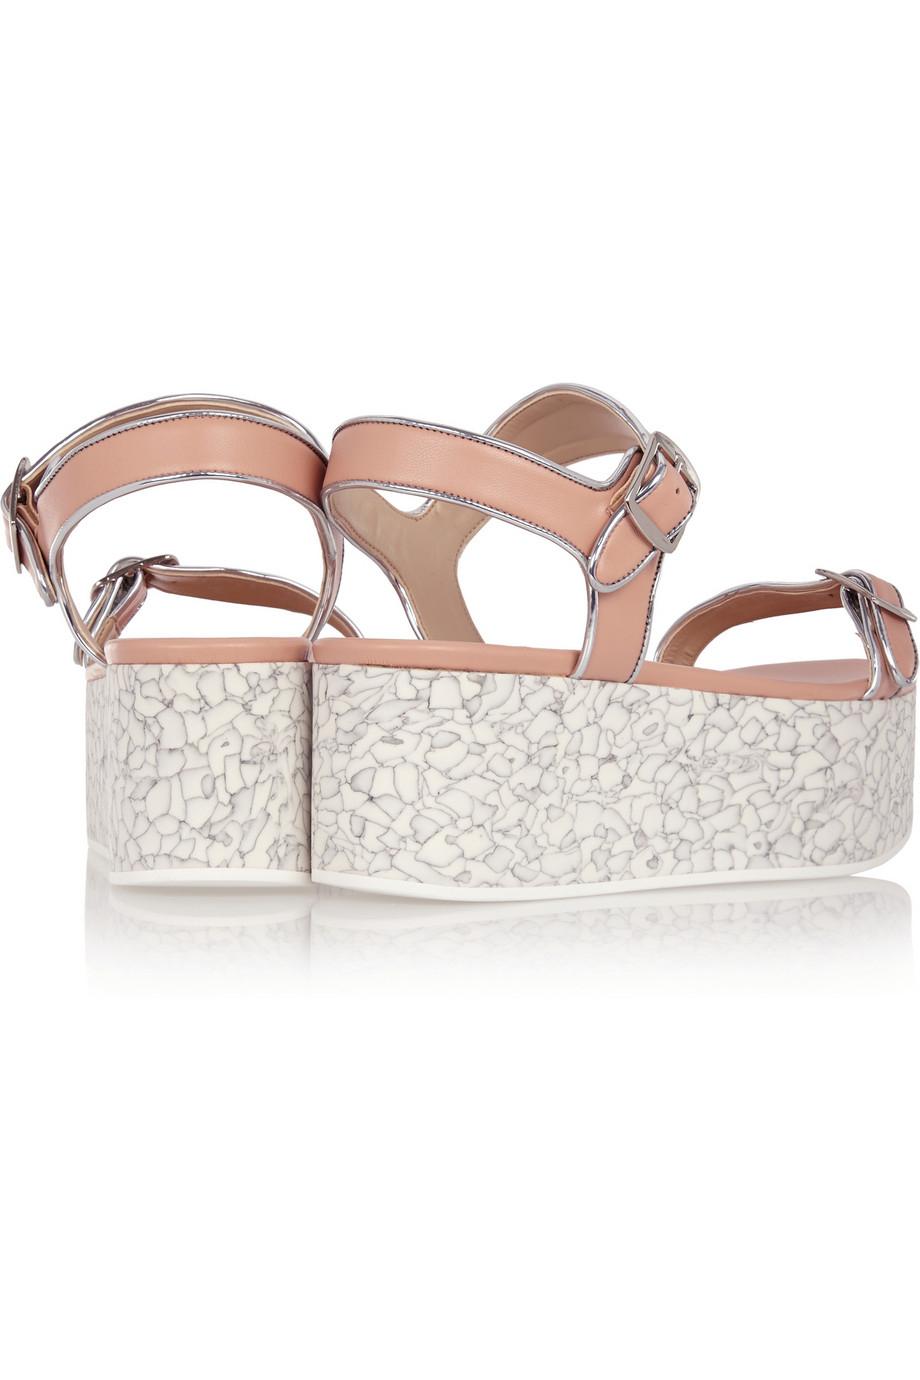 c8a27b49062cc Stella Mccartney Faux Leather Platform Sandals